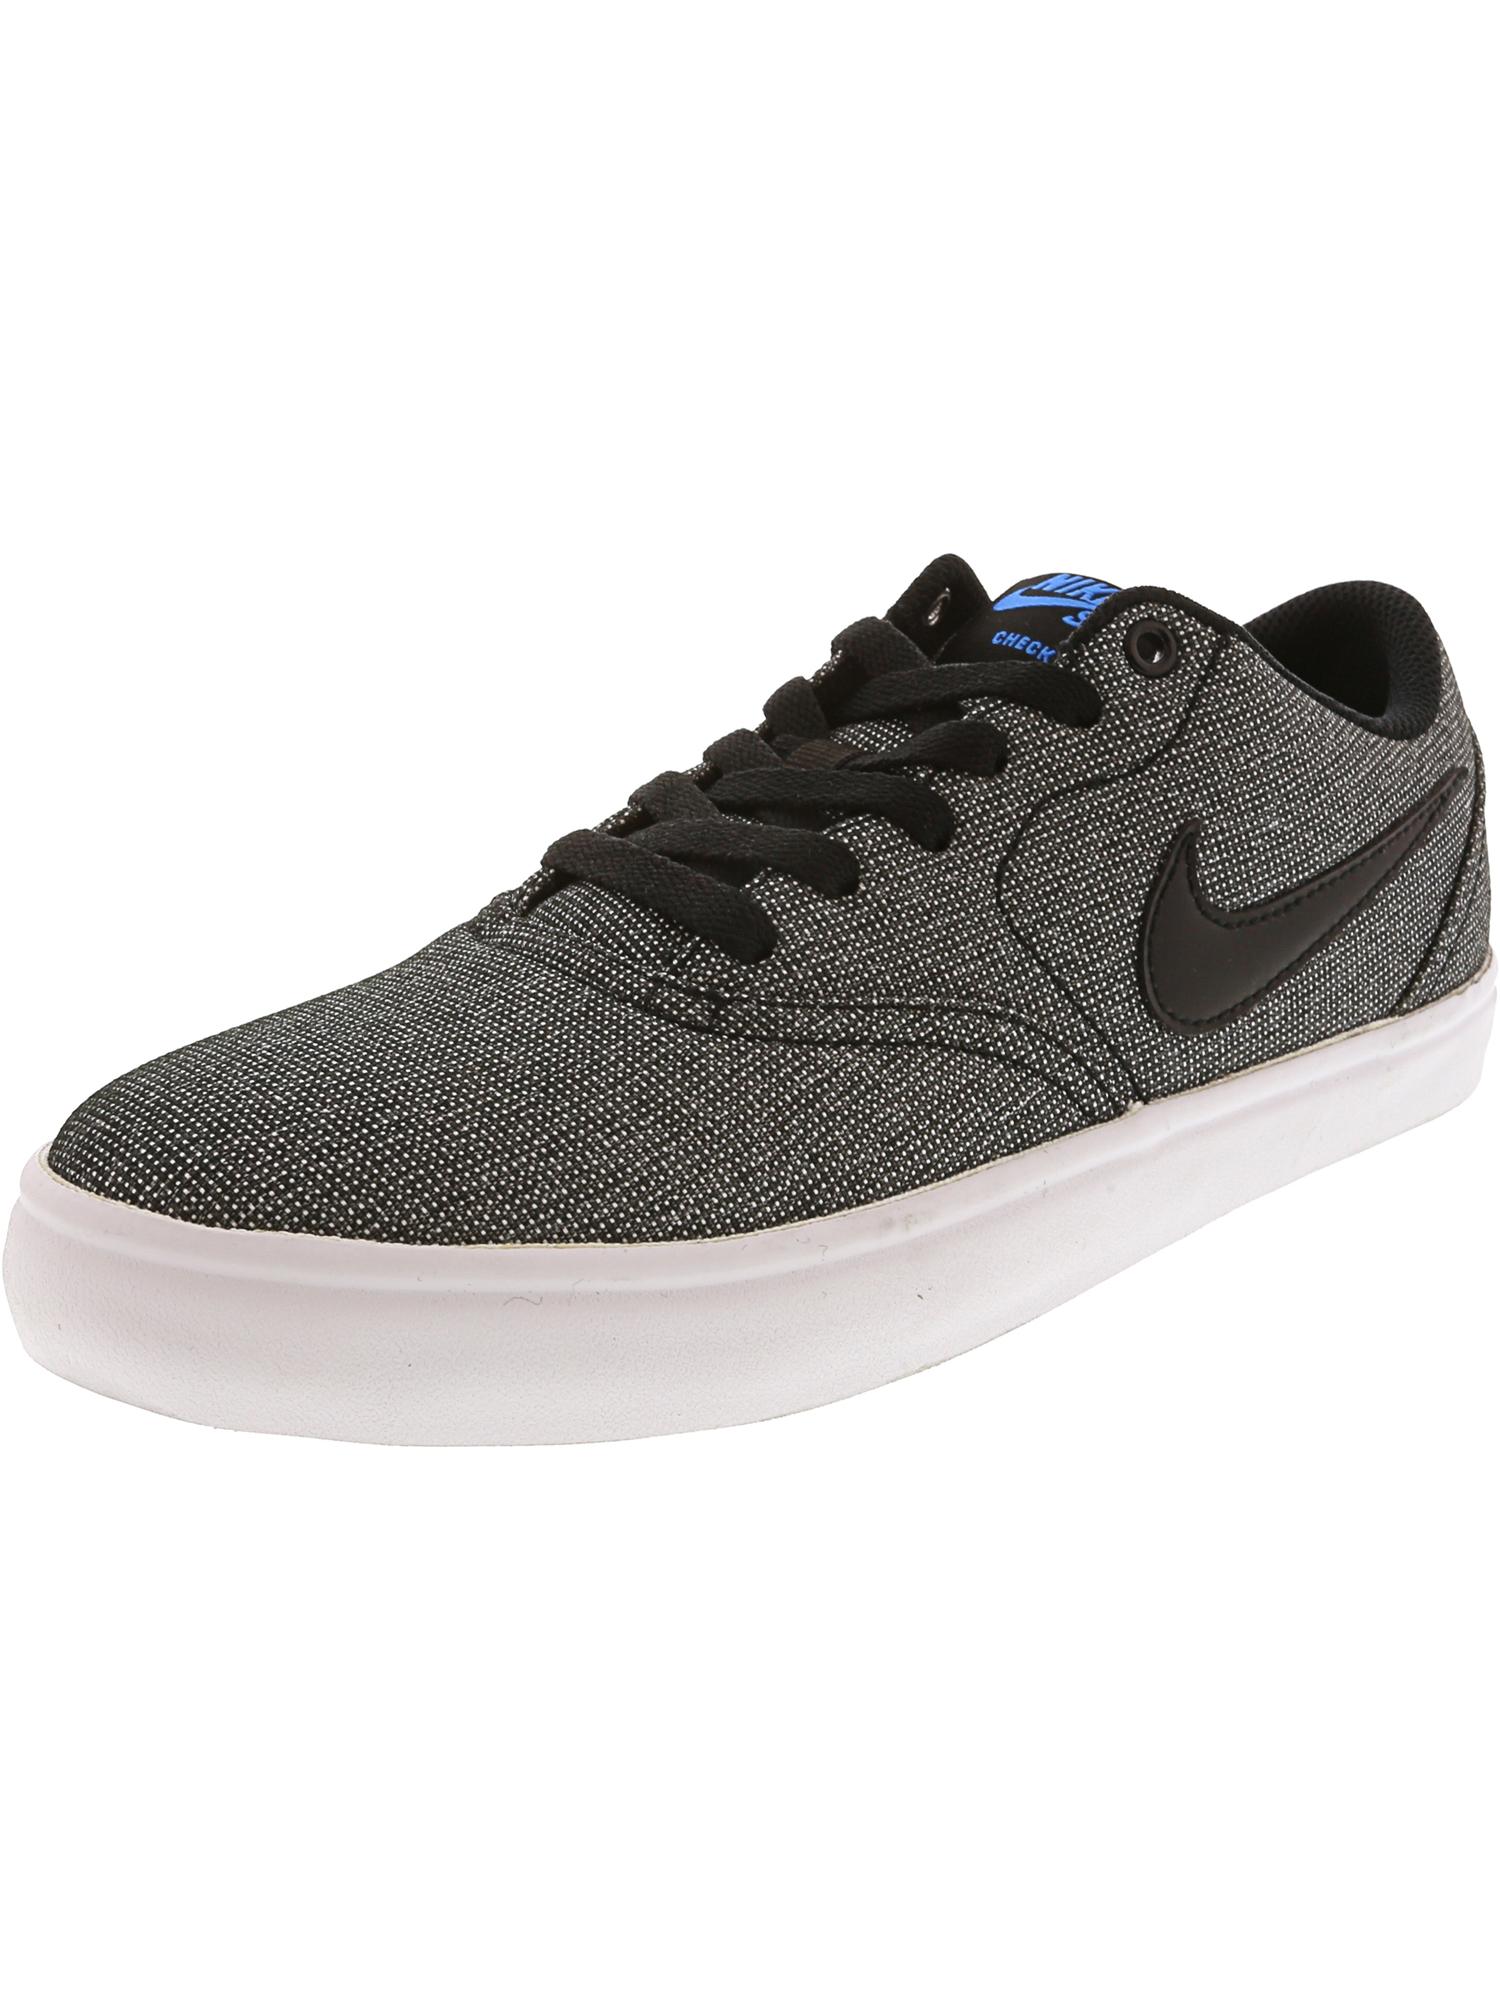 best website e9763 85b10 Nike Sb Check Solar Canvas Black  - White Photo Blue Ankle-High  Skateboarding Shoe 8.5M 7M